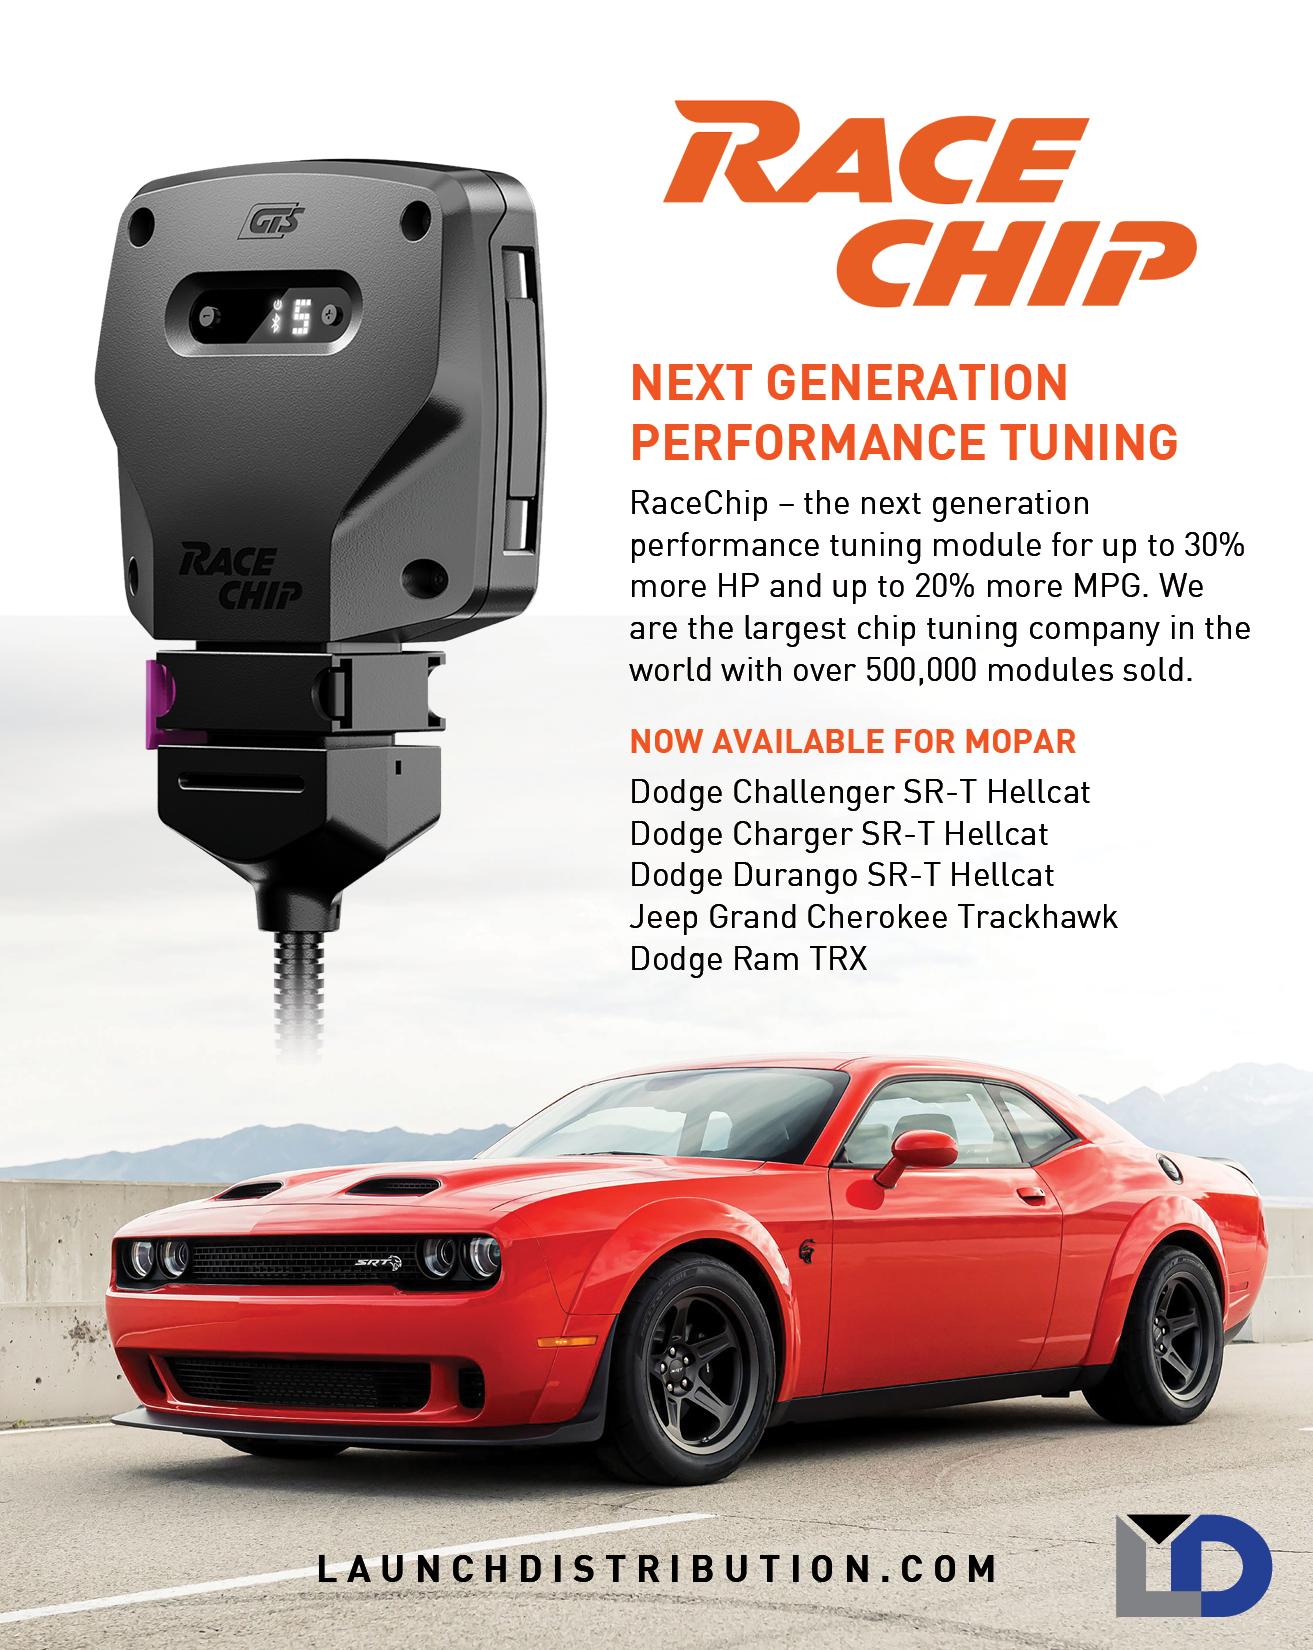 RaceChip SR-T Hellcat Tuning Module